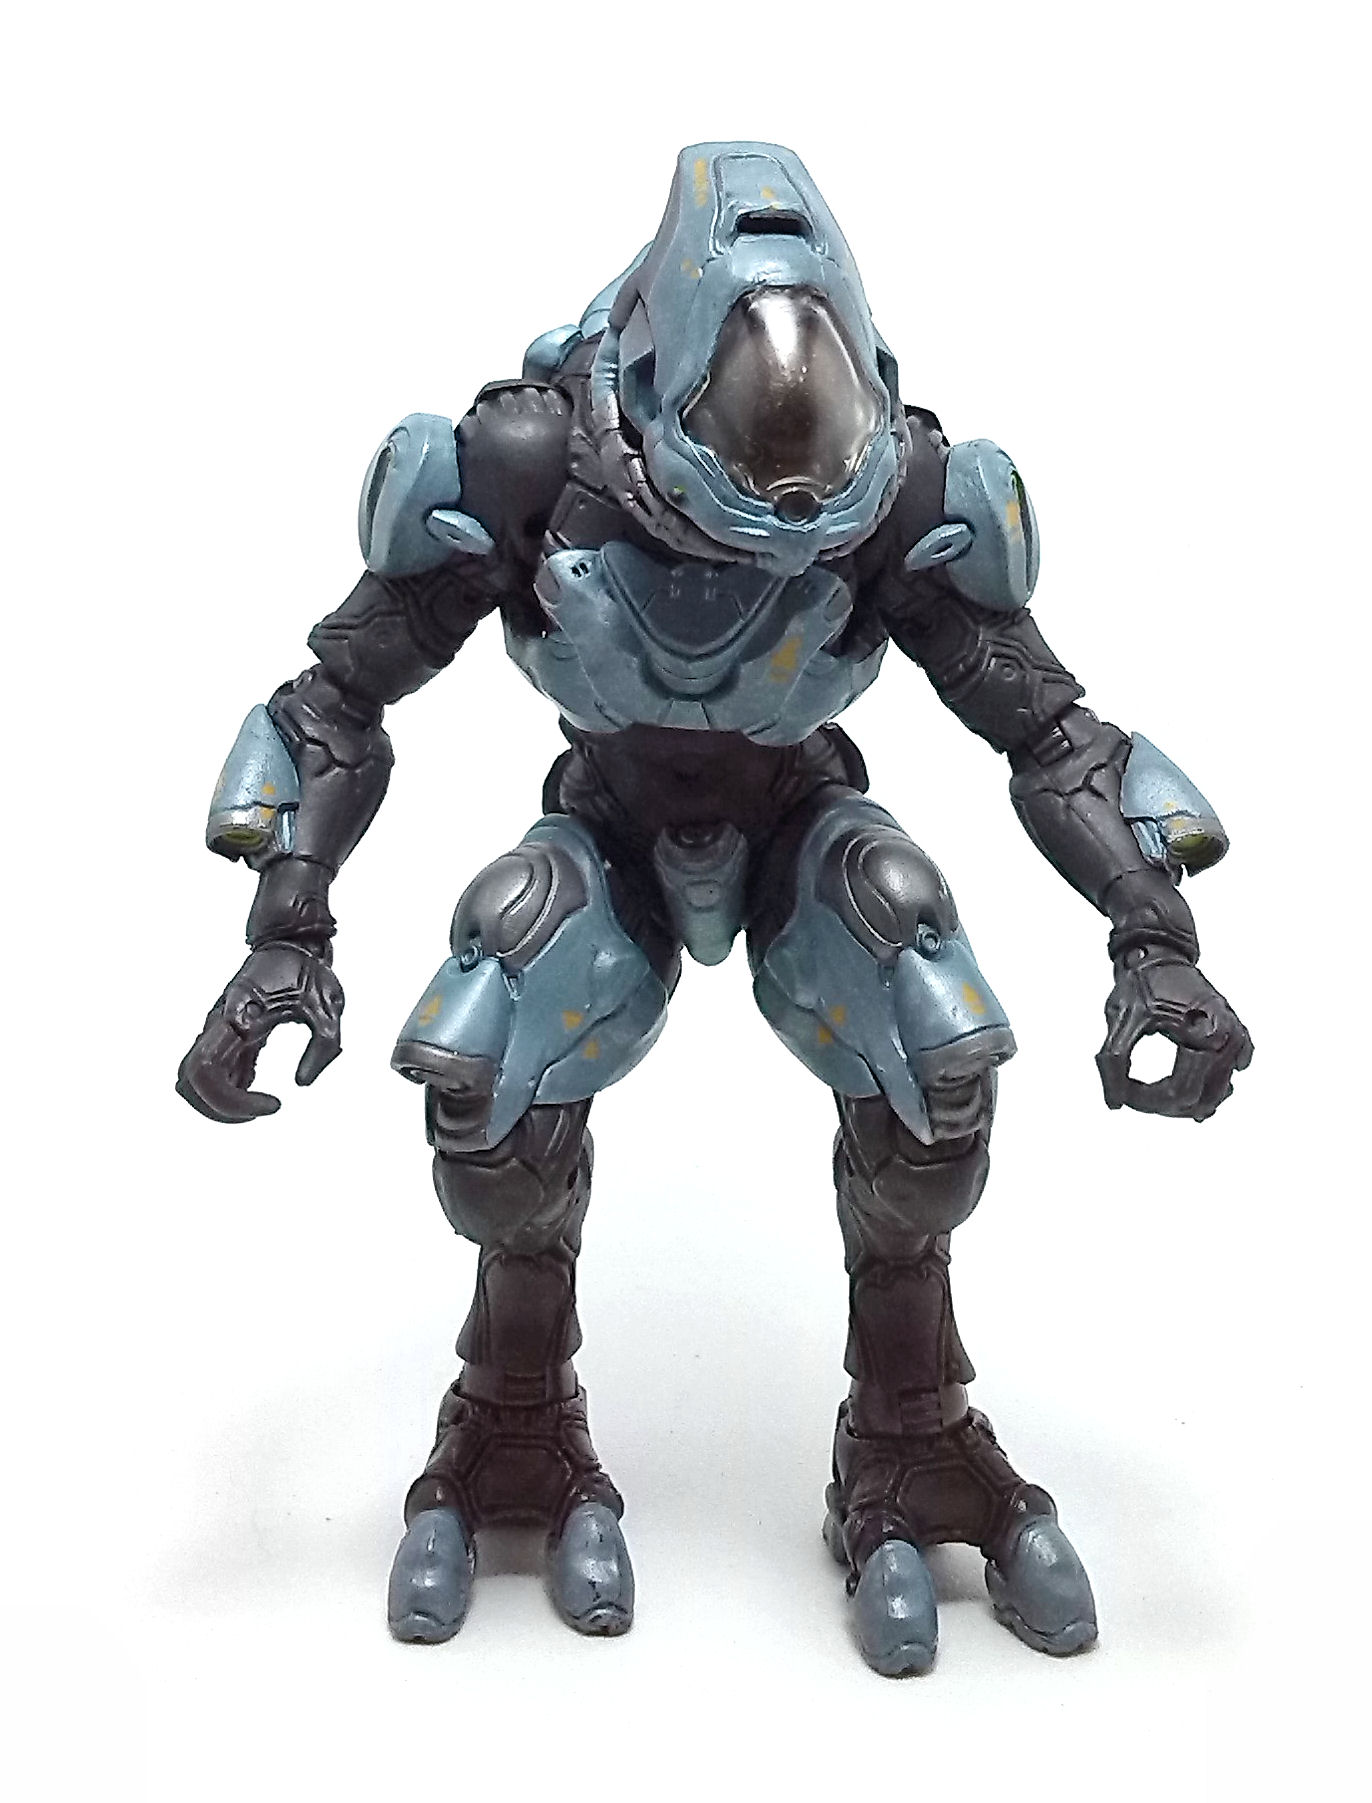 Halo 3 Elites vs Halo 4 Elites Elite Ranger h4 3 in Halo 4